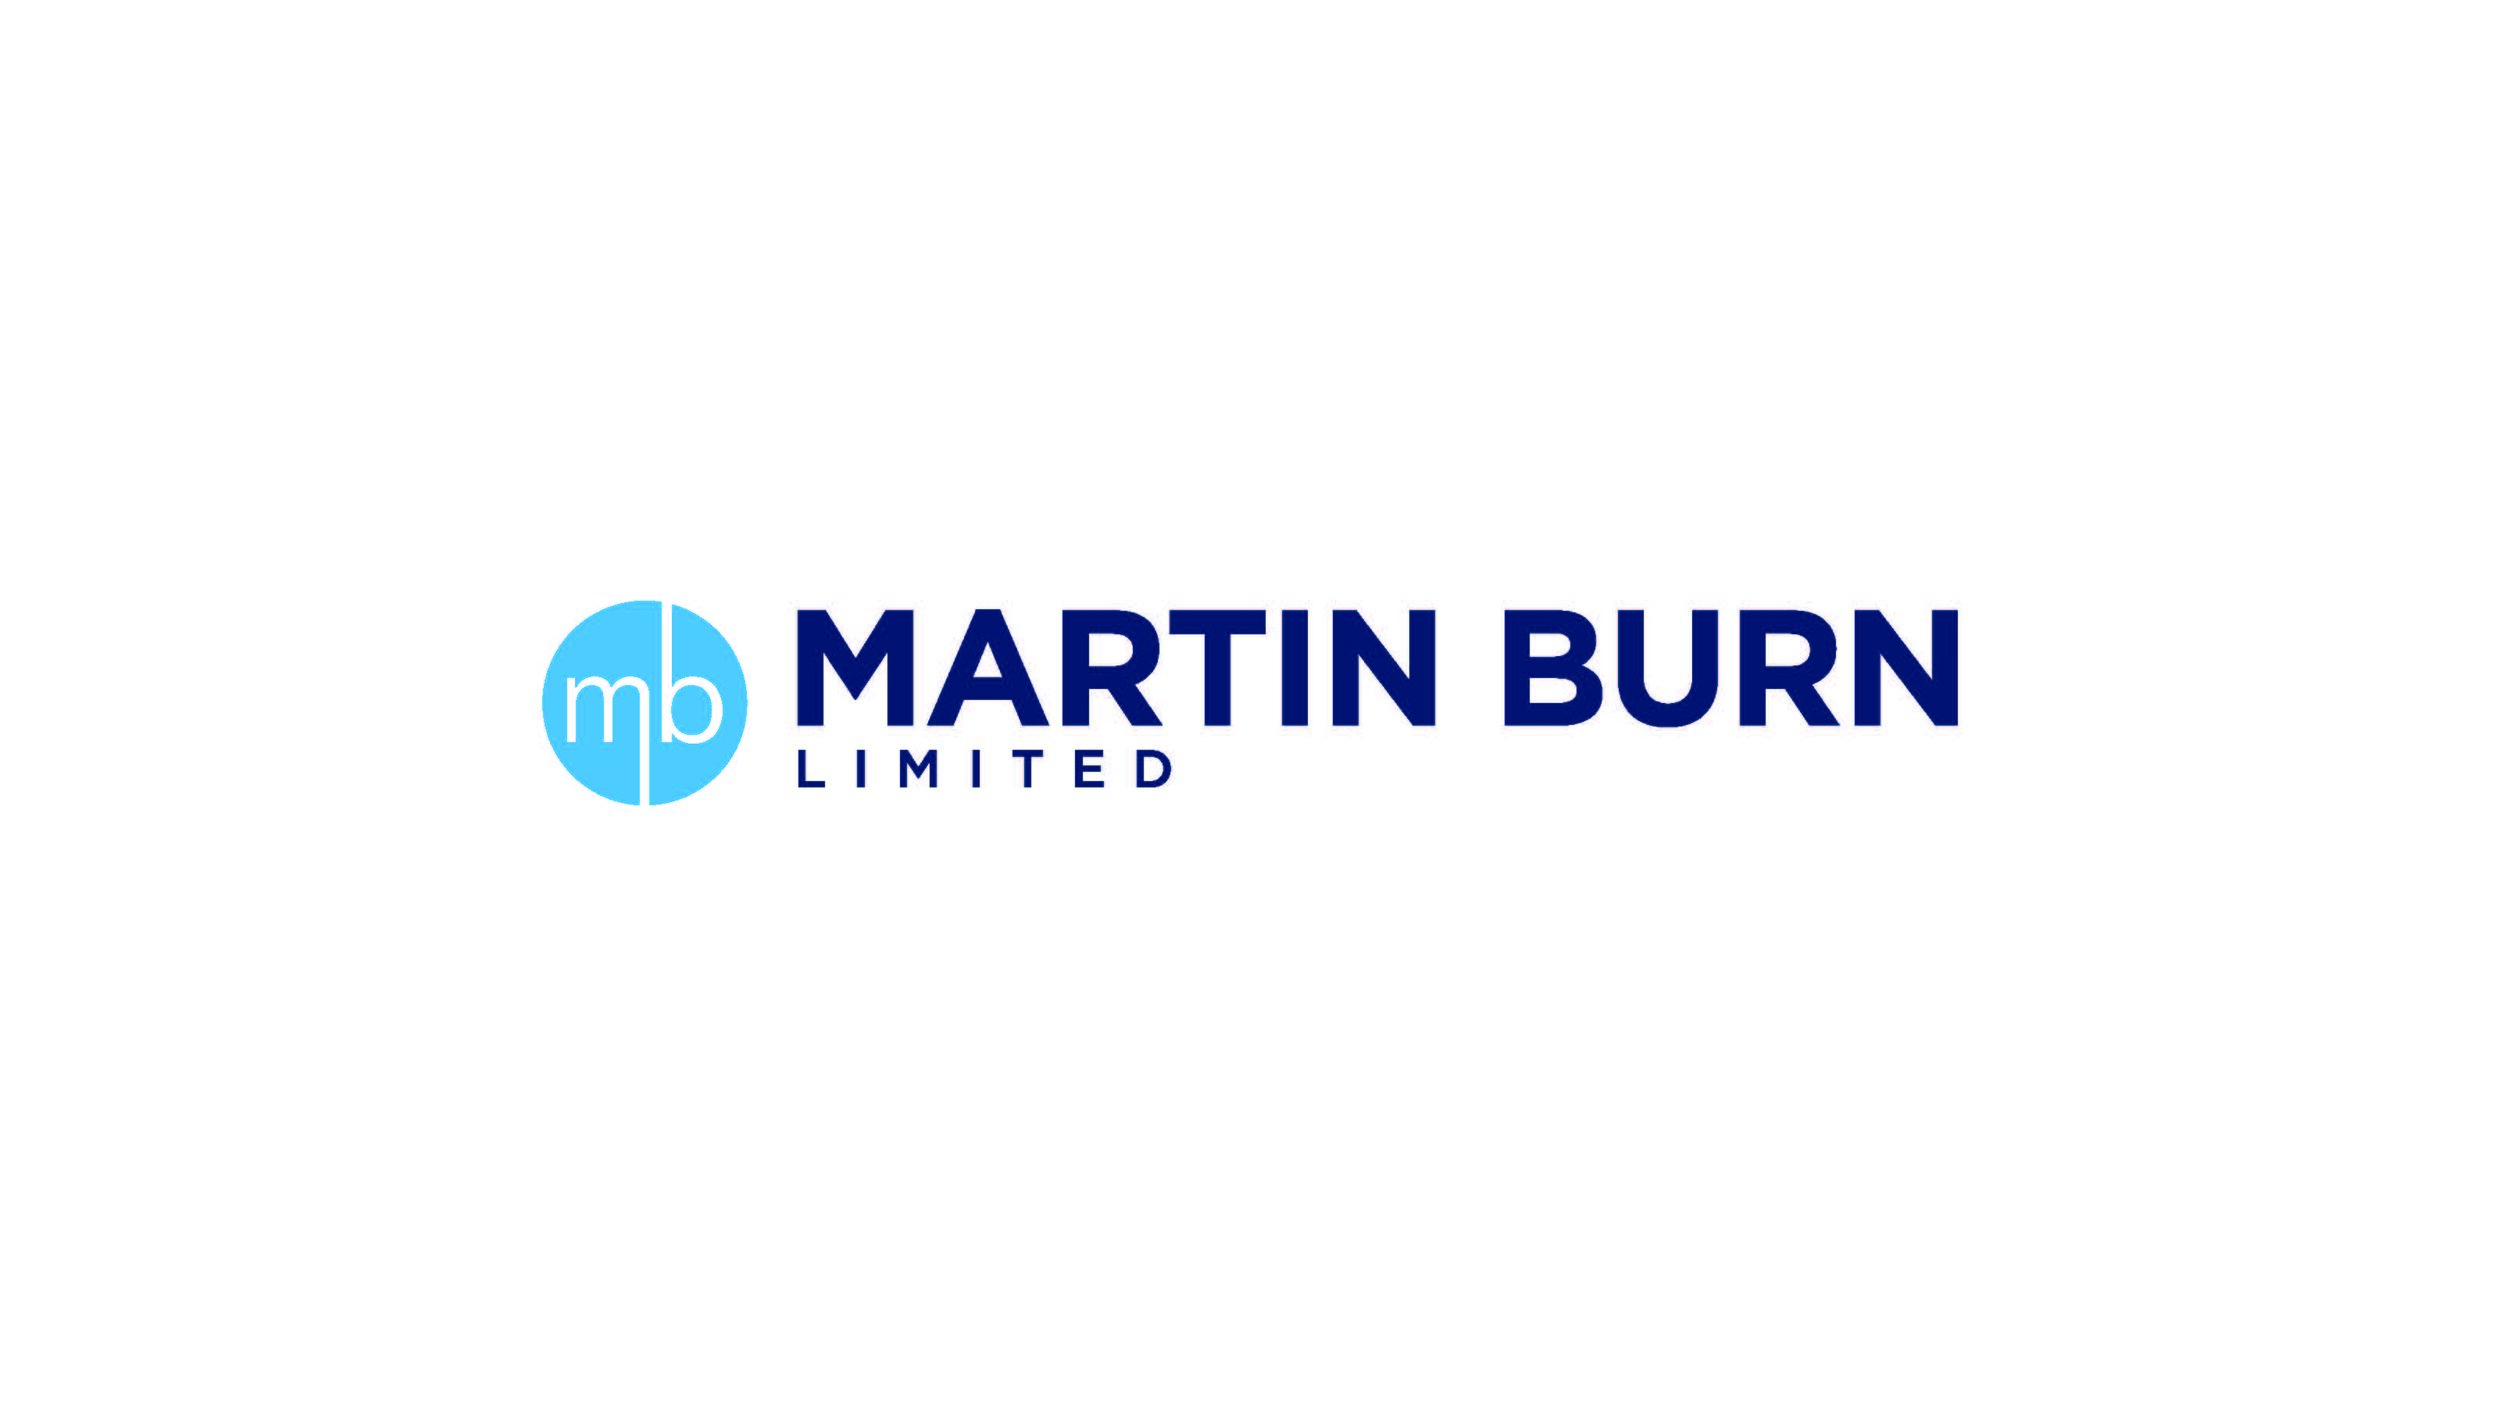 Martin Burn Logoset_Page_2.jpg